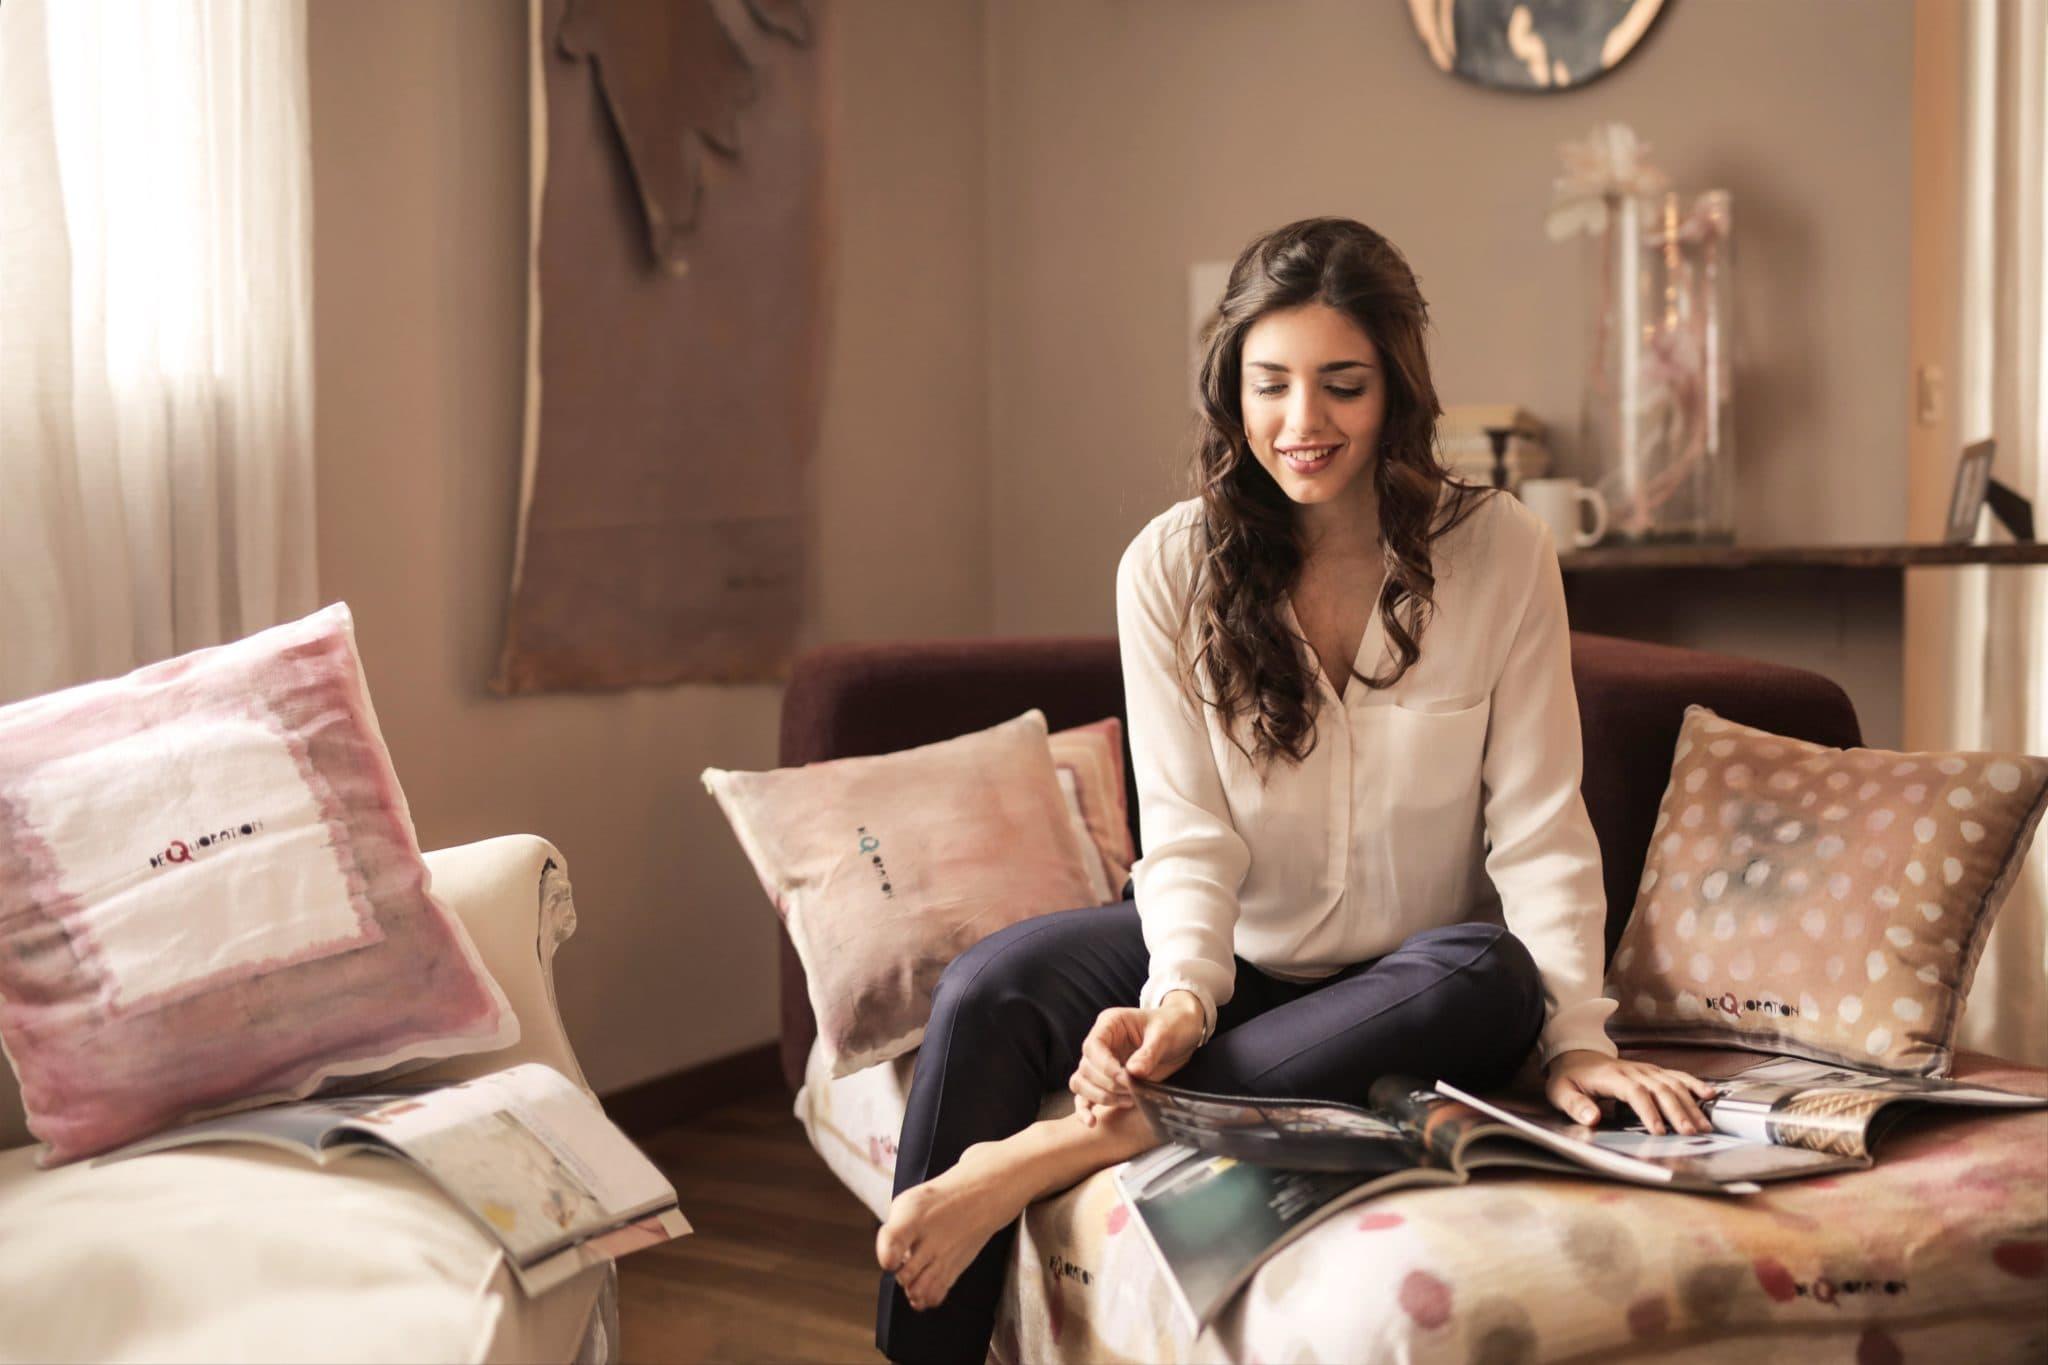 Single Frau am Wochenende alleine auf dem Sofa